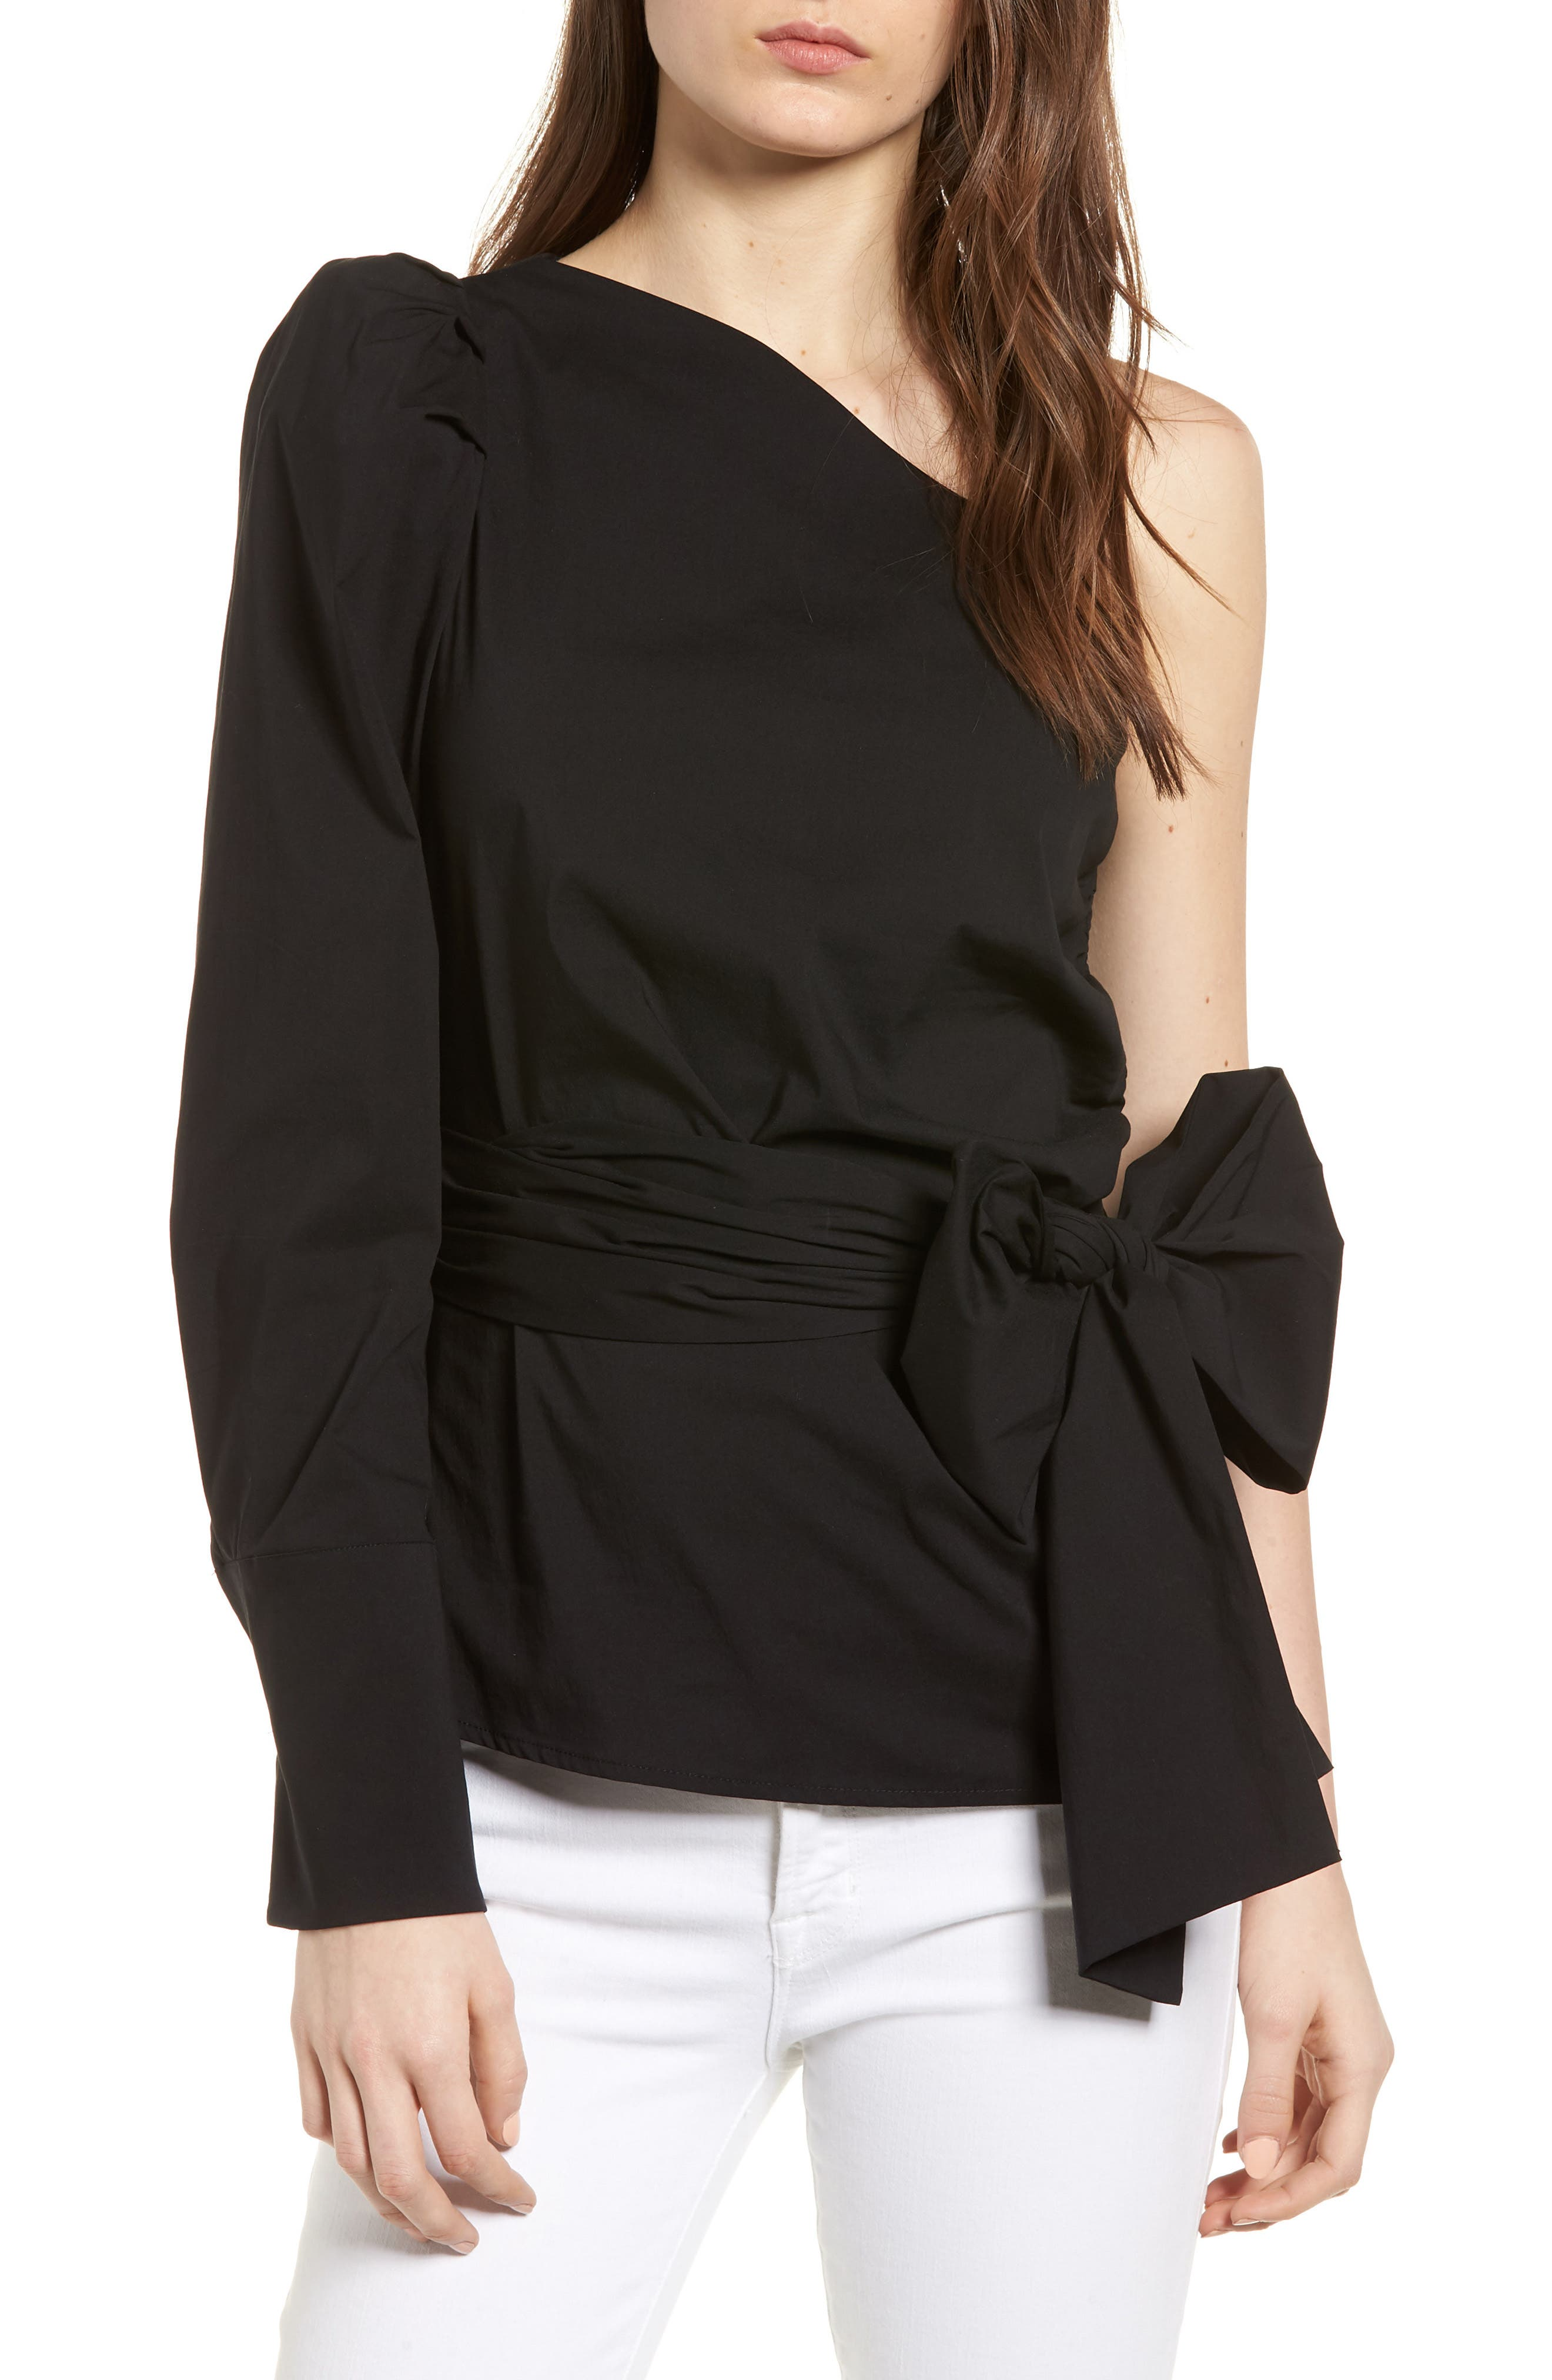 Bishop + Young Belted One-Shoulder Blouse,                             Main thumbnail 1, color,                             BLACK